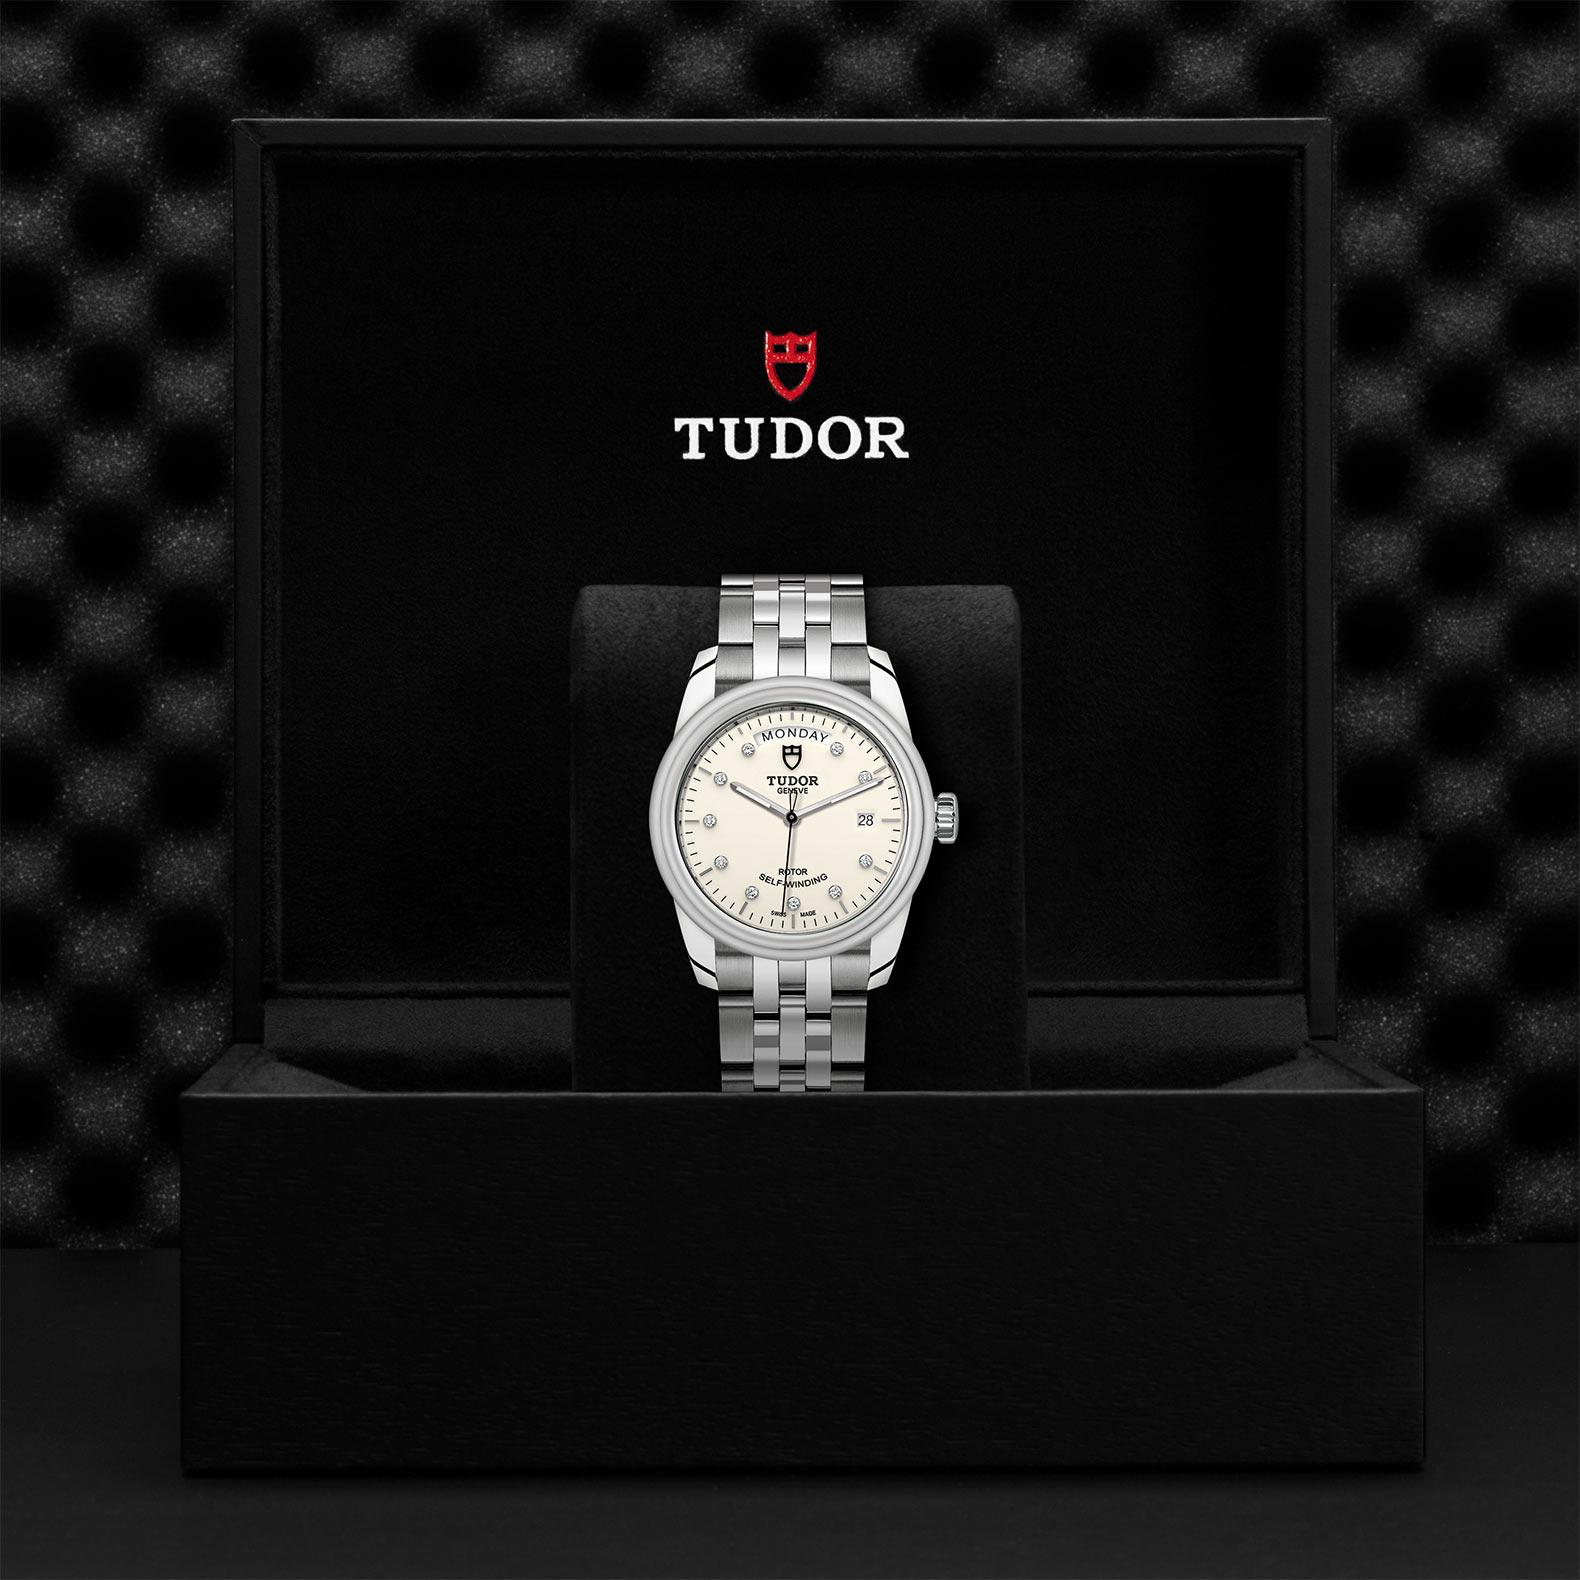 TUDOR Glamour Date Day M56000 0182 Presentationbox